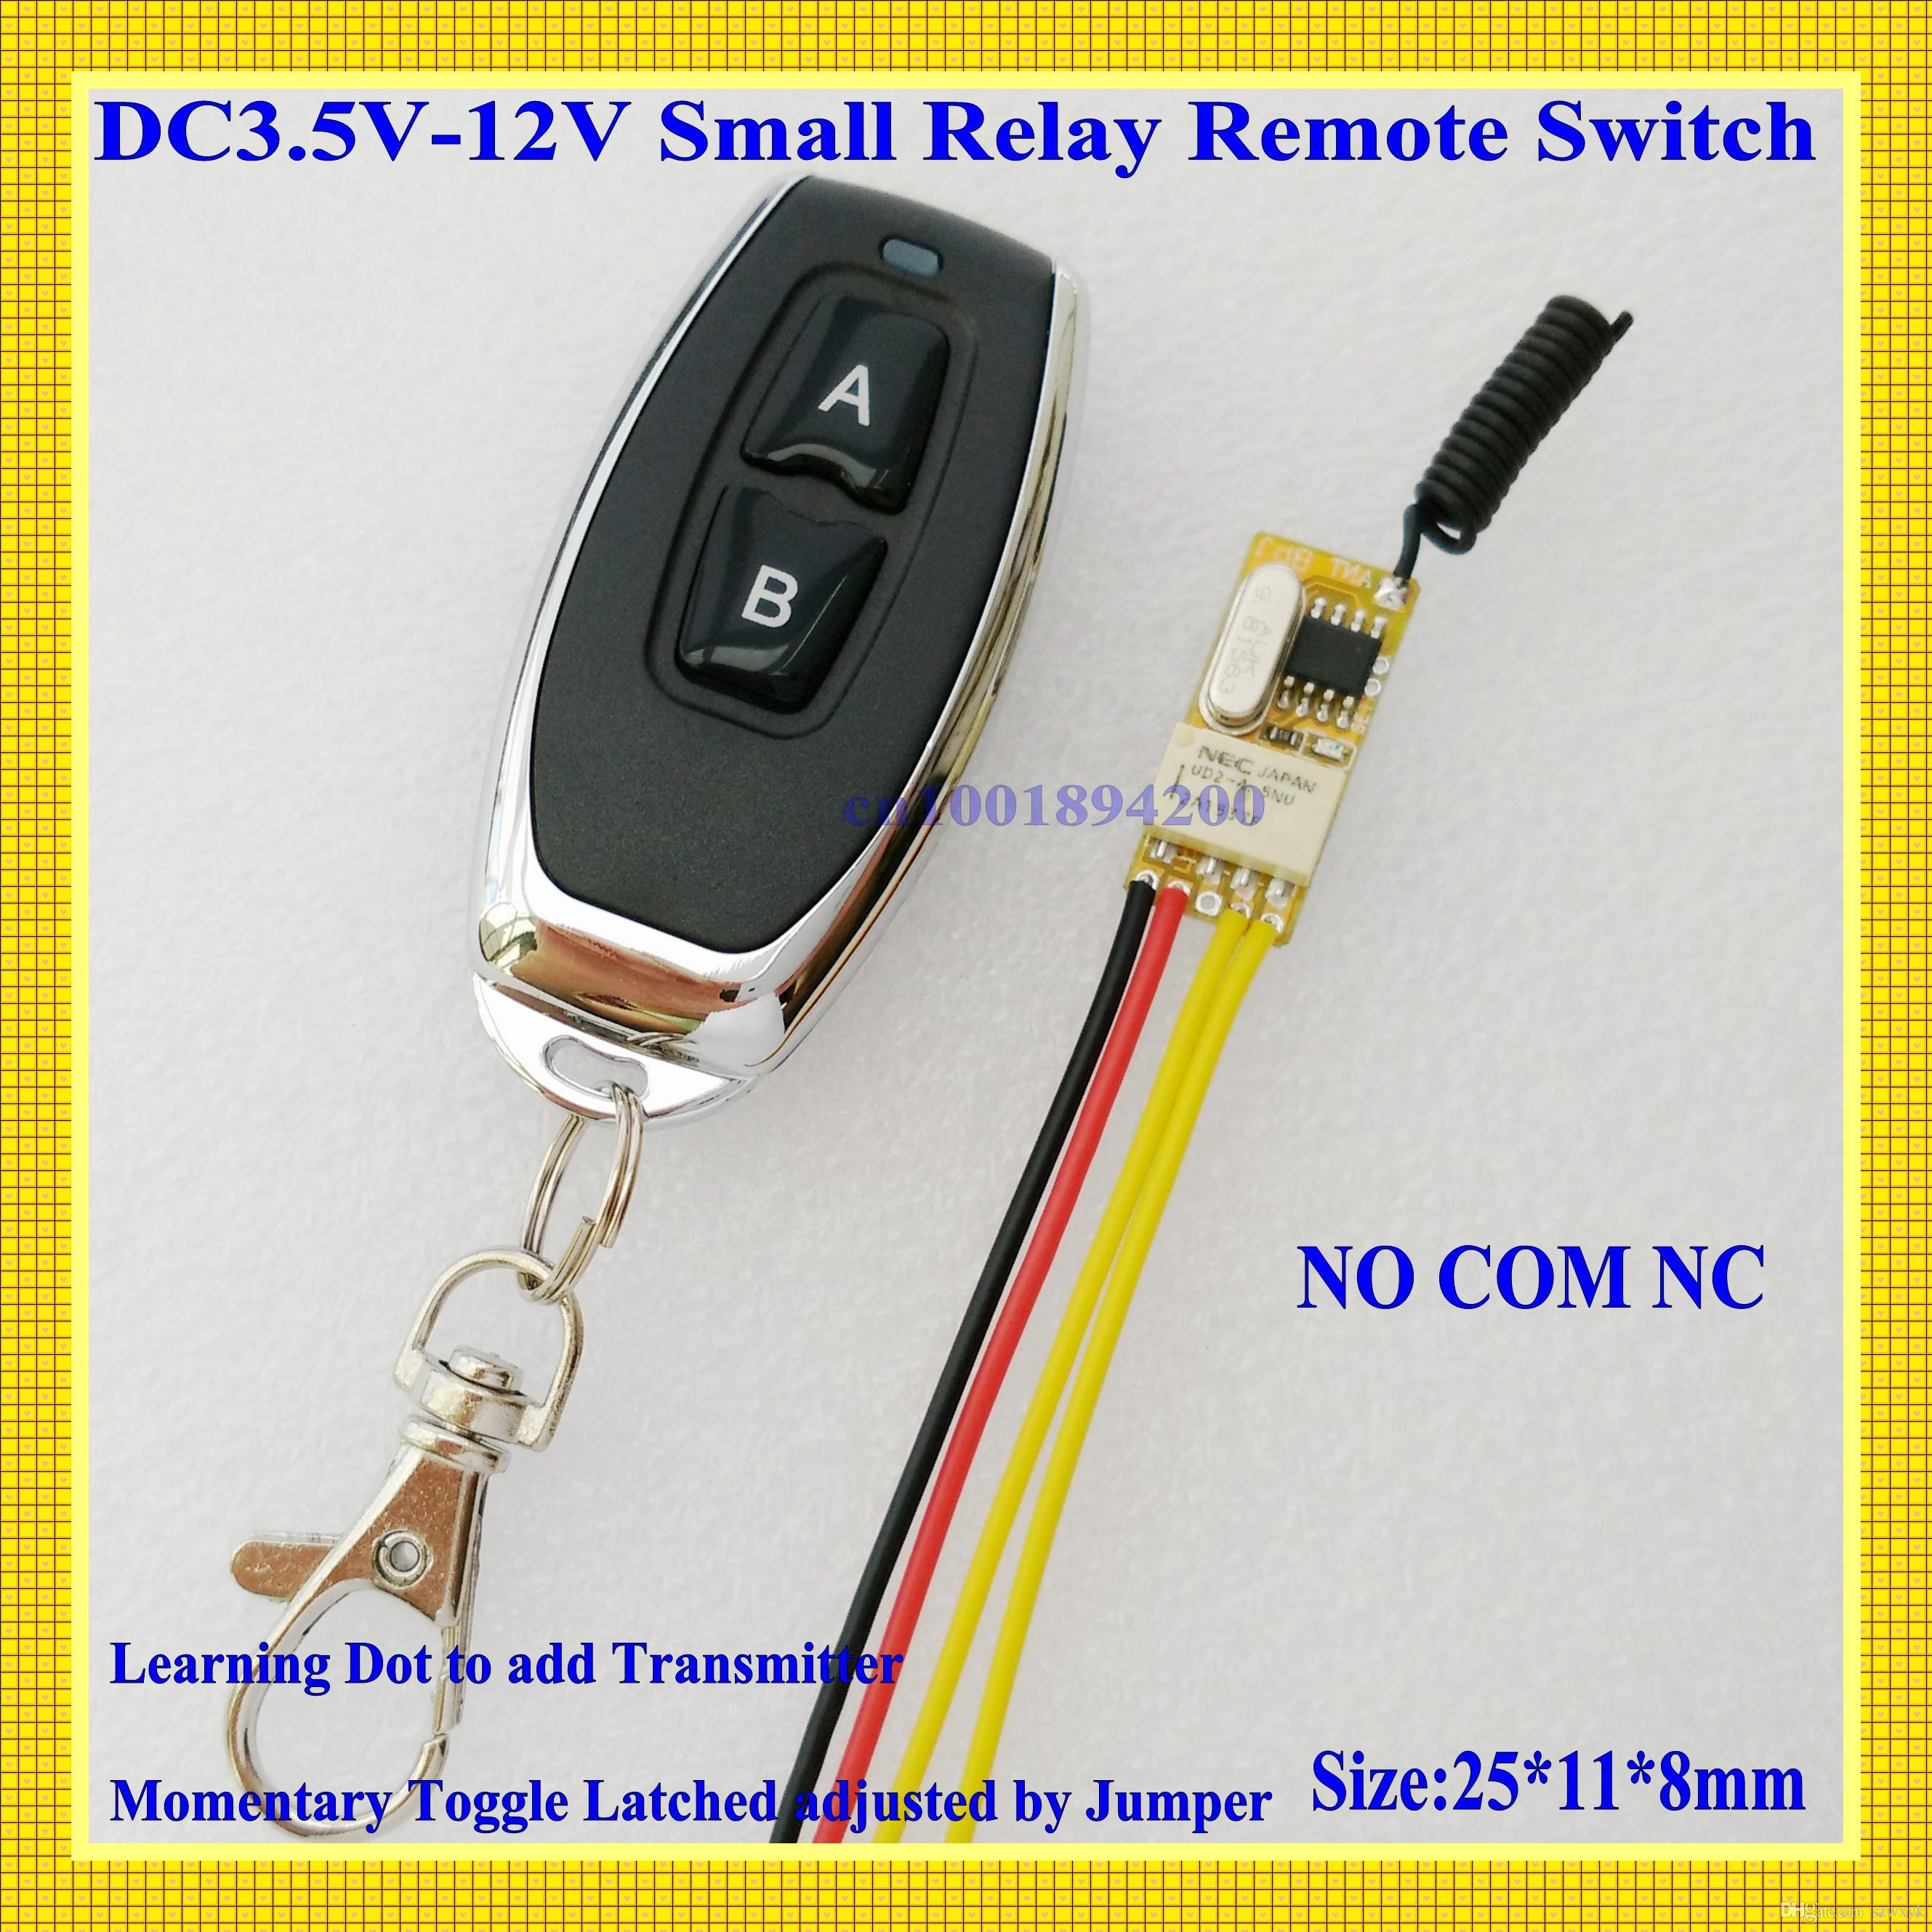 automatic door control systems - Electric Control Lock Door Access Control System Automatic Door Micro Mini Remote Control Switch DC V V V V V V V